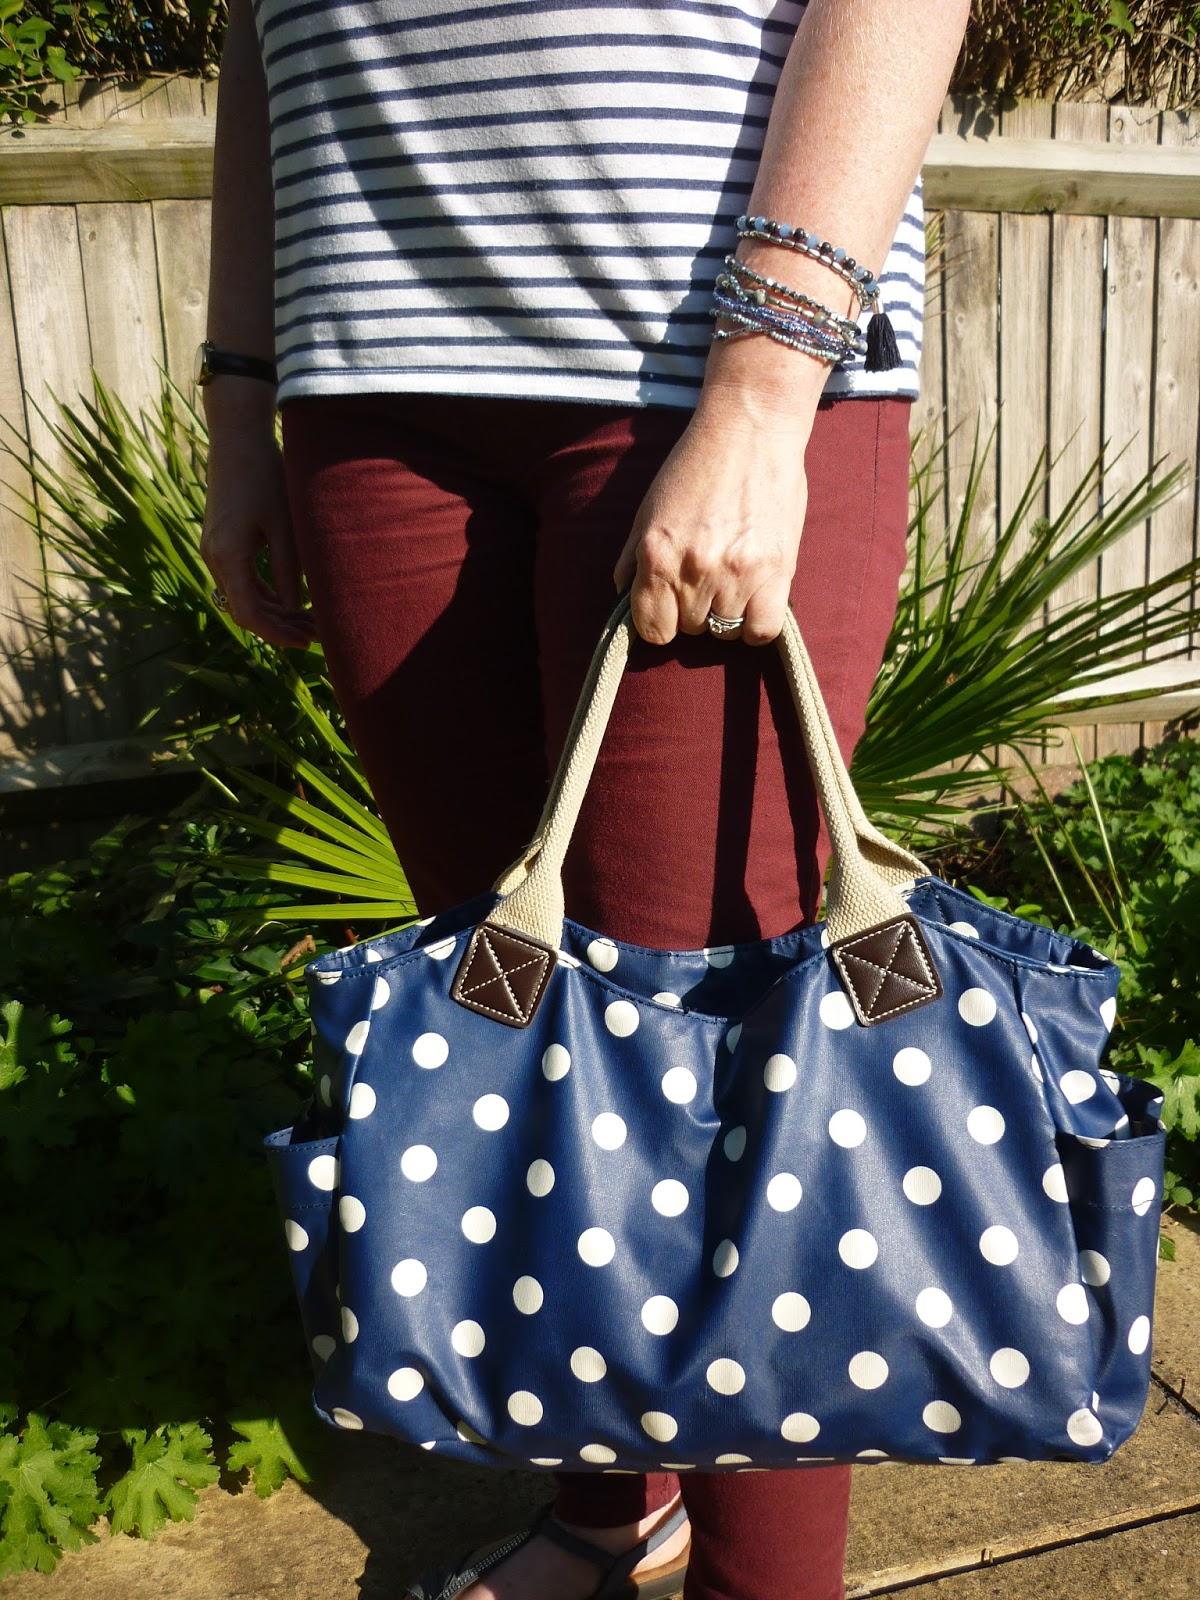 Ochre Skinny Jeans, Polka Dot Bag | Petite Silver Vixen